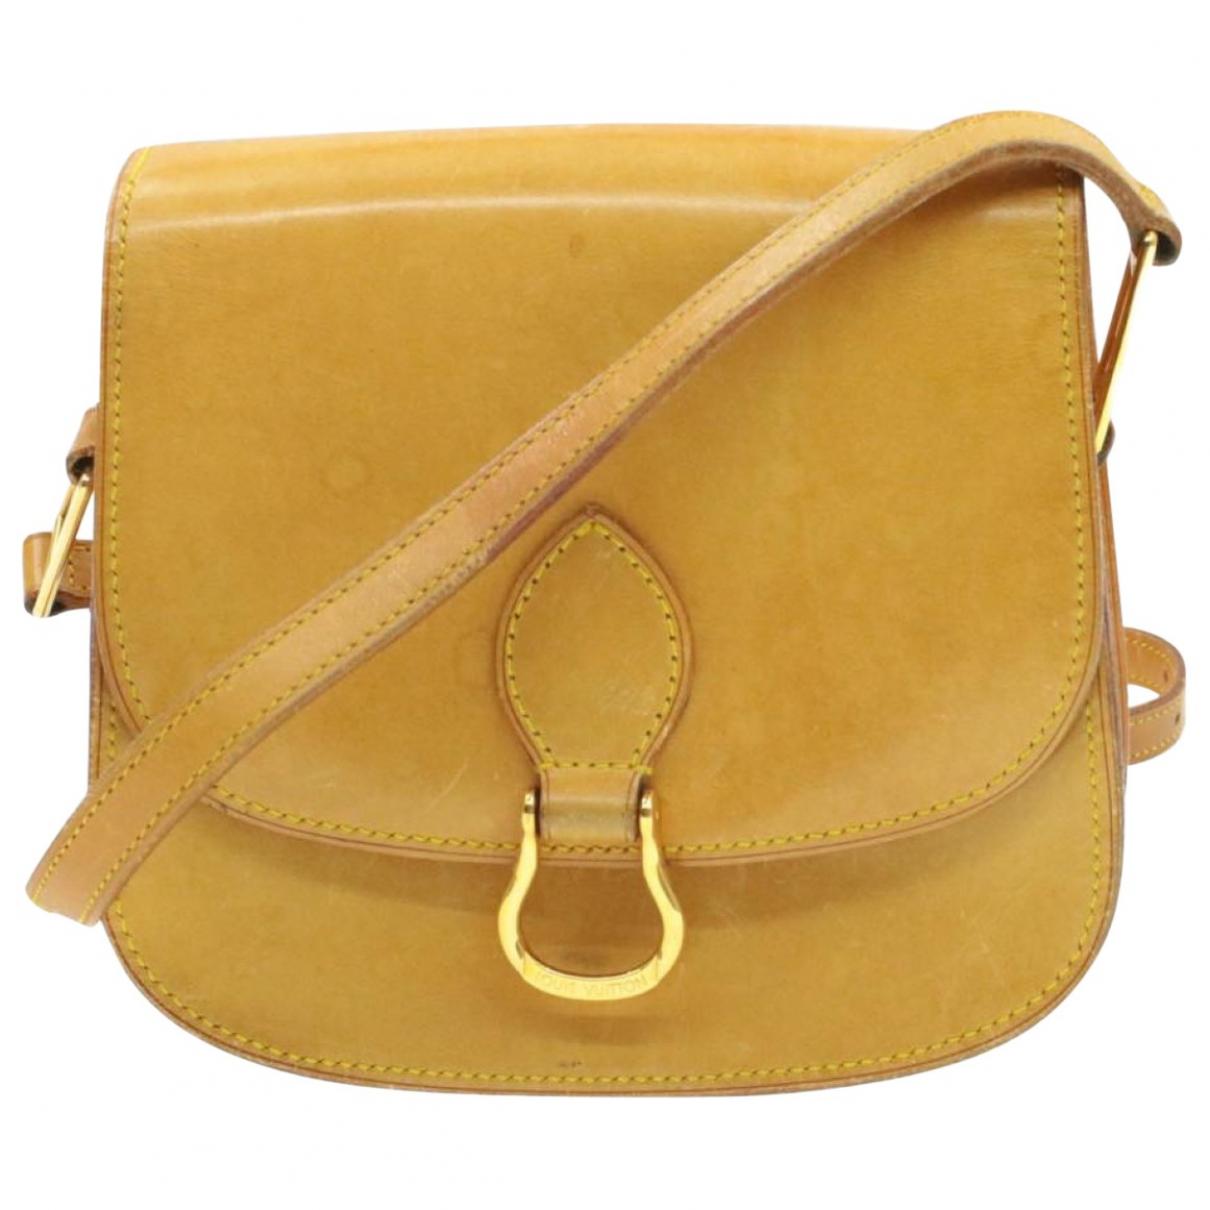 Louis Vuitton Saint Cloud Handtasche in  Braun Leder